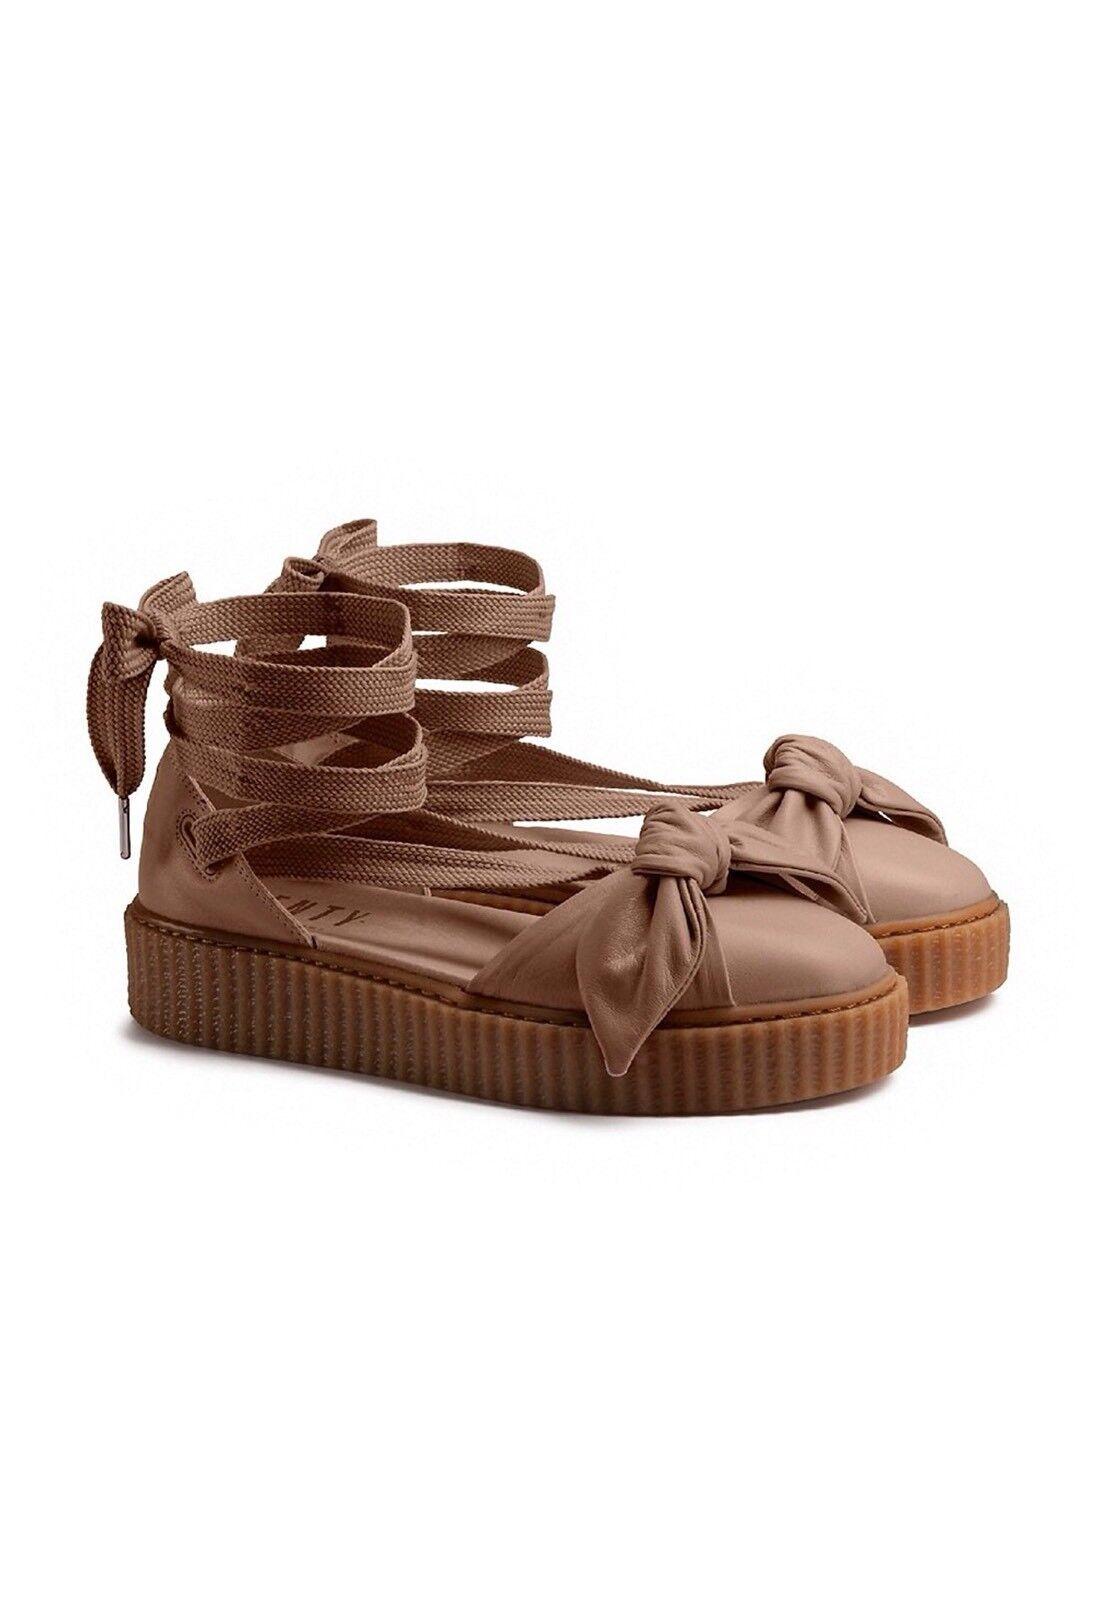 Puma Fenty By Rihanna Womens Bow Creeper Sandal Natural Oatmeal 365794-03 7.5us